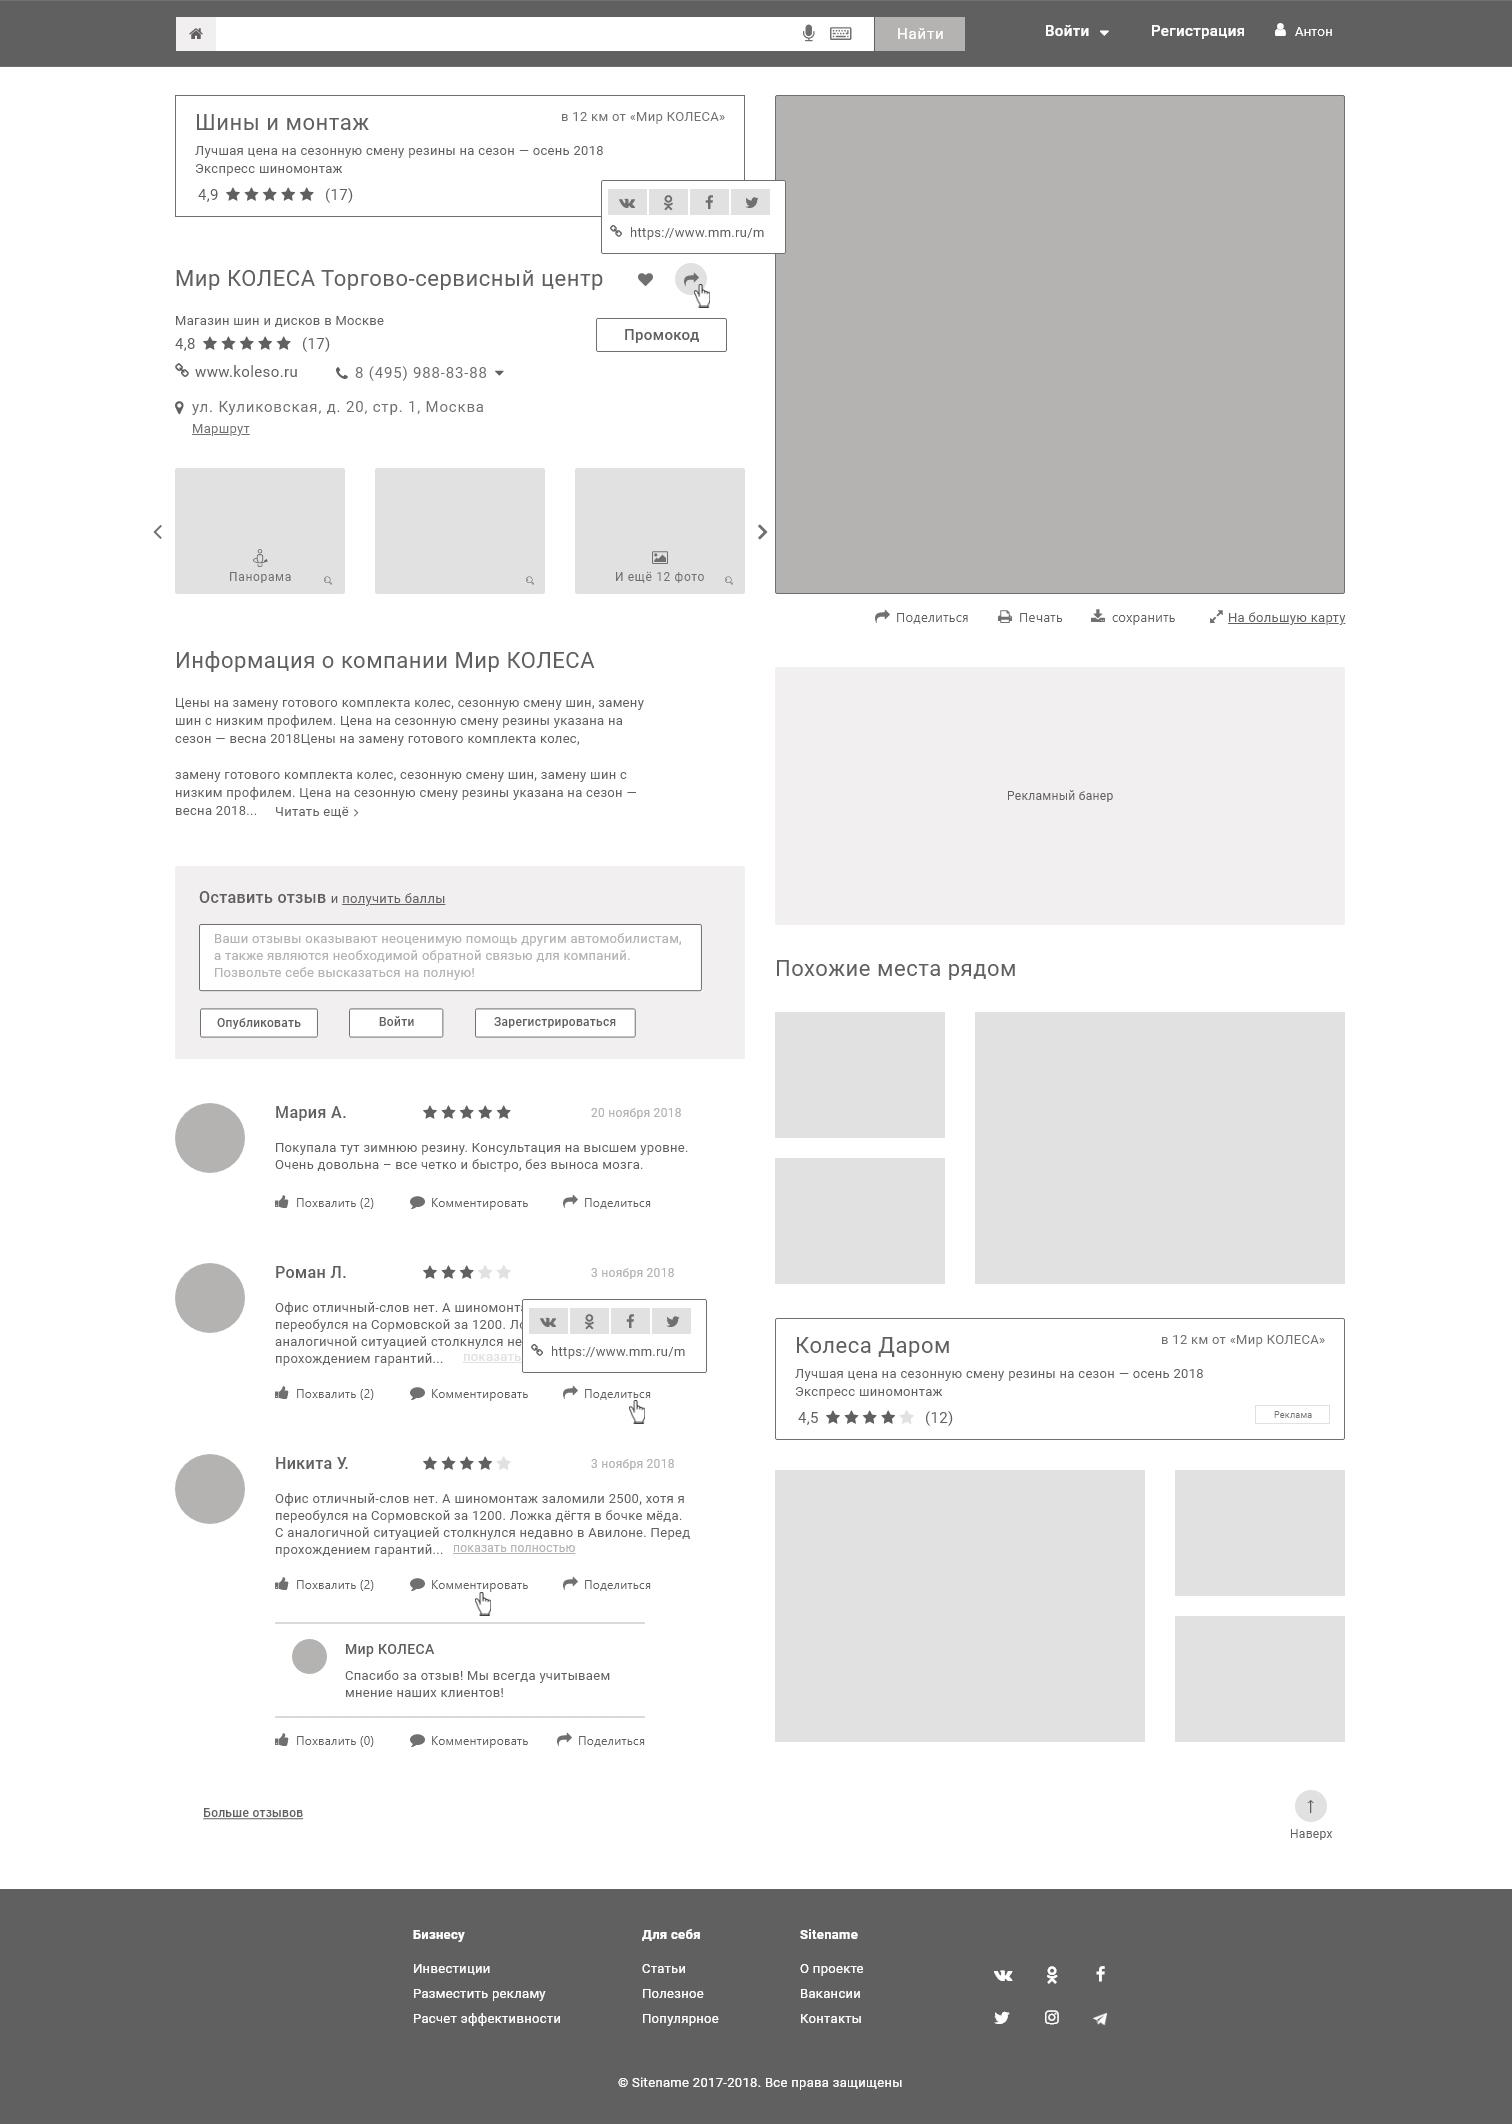 Разработка UI/UX для сервиса-поисковика компаний